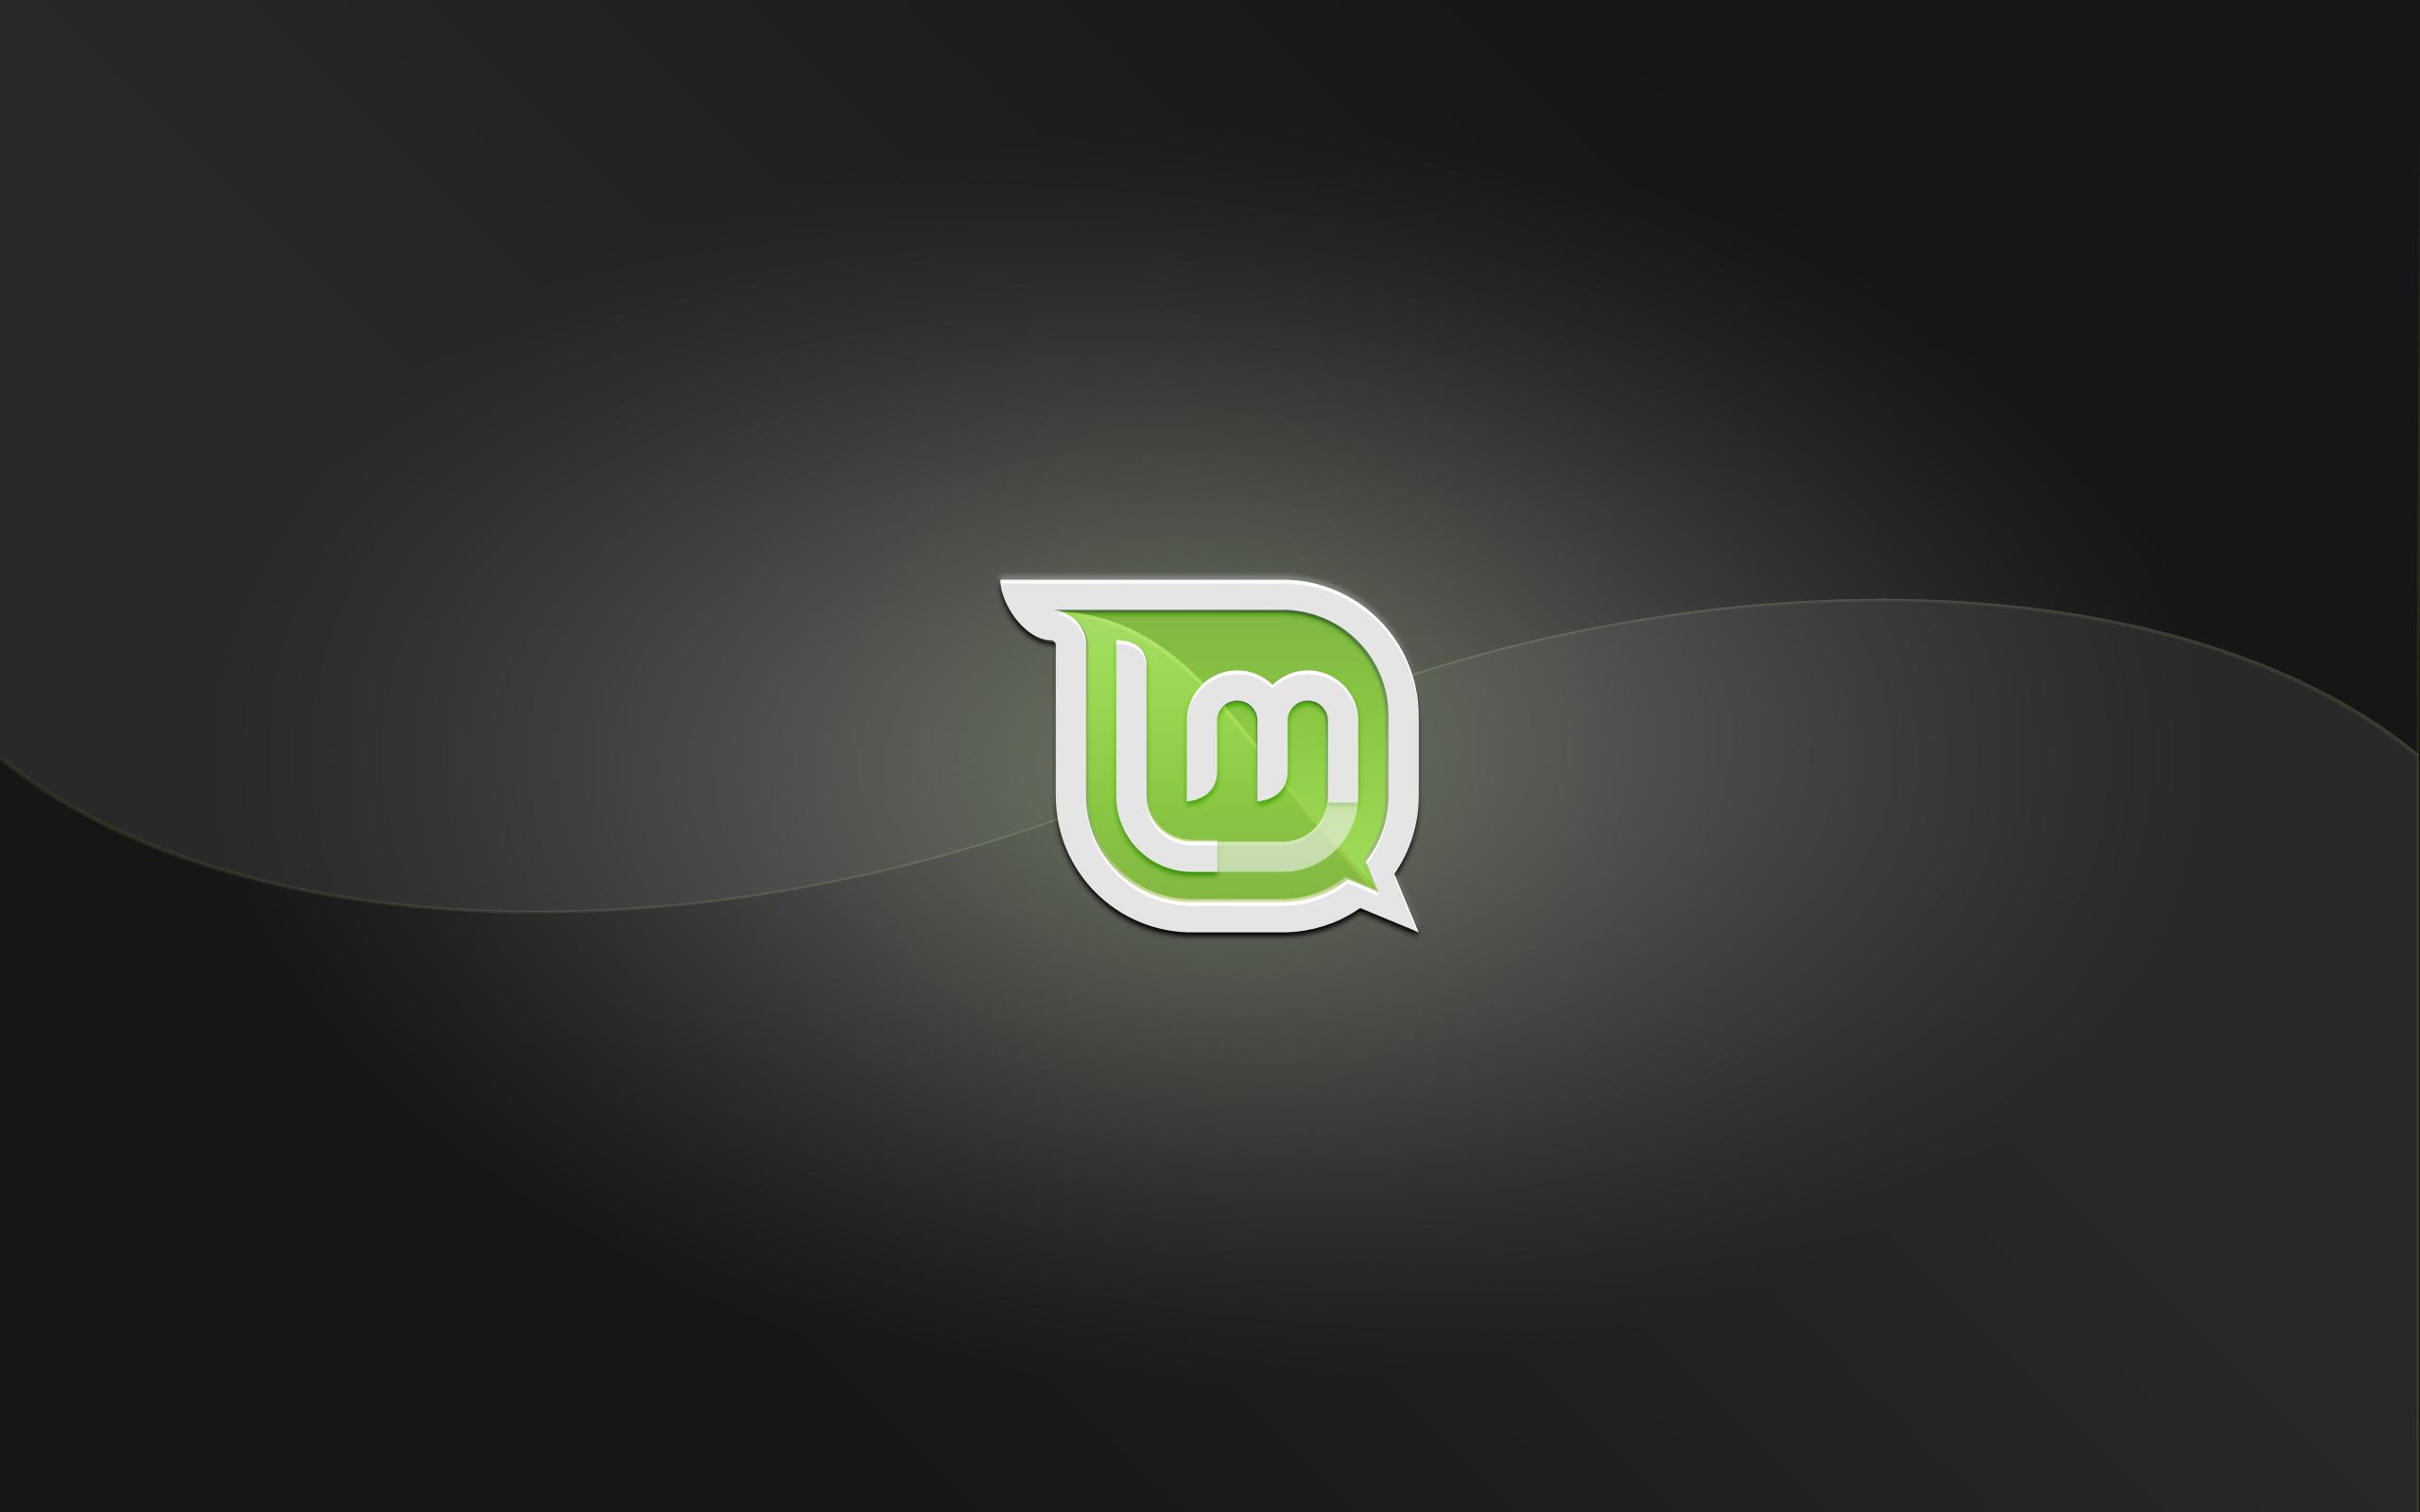 Linux Mint Wallpaper 01